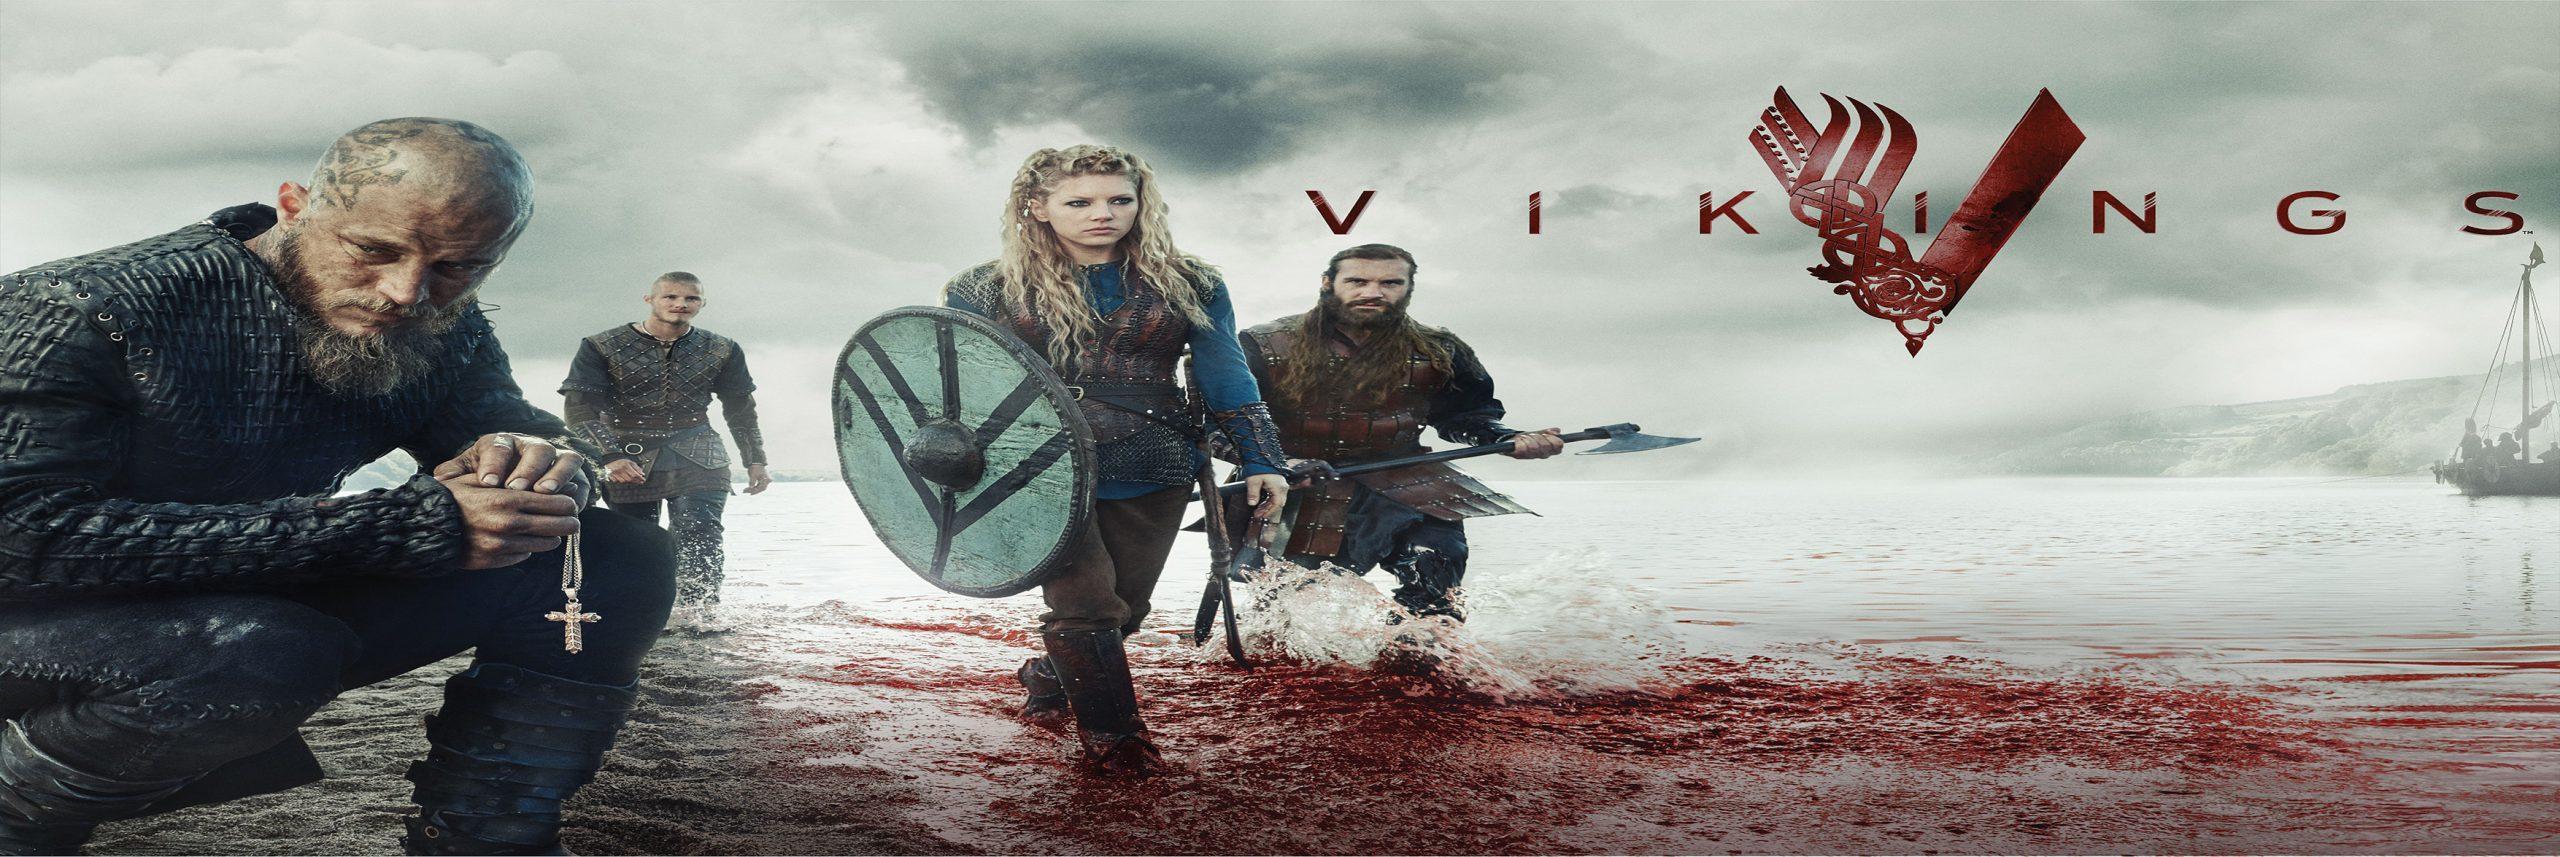 وایکینگ ها – Vikings